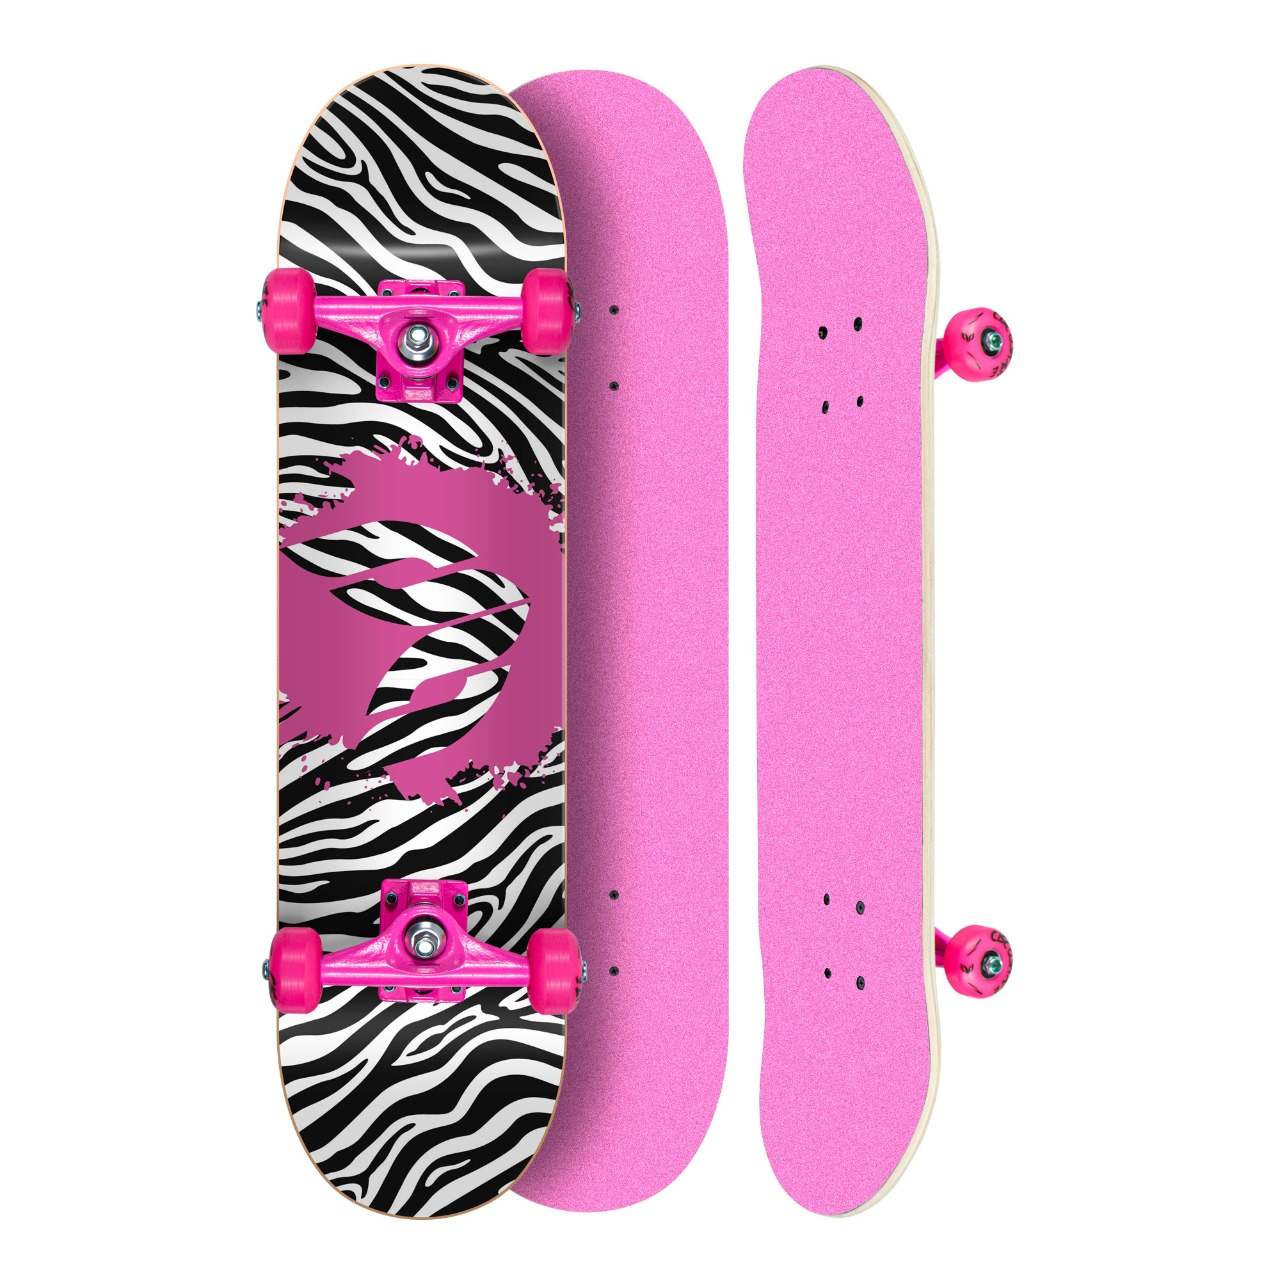 Skate Montado Profissional Cisco Feminino Lixa/Truck/Roda Rosa